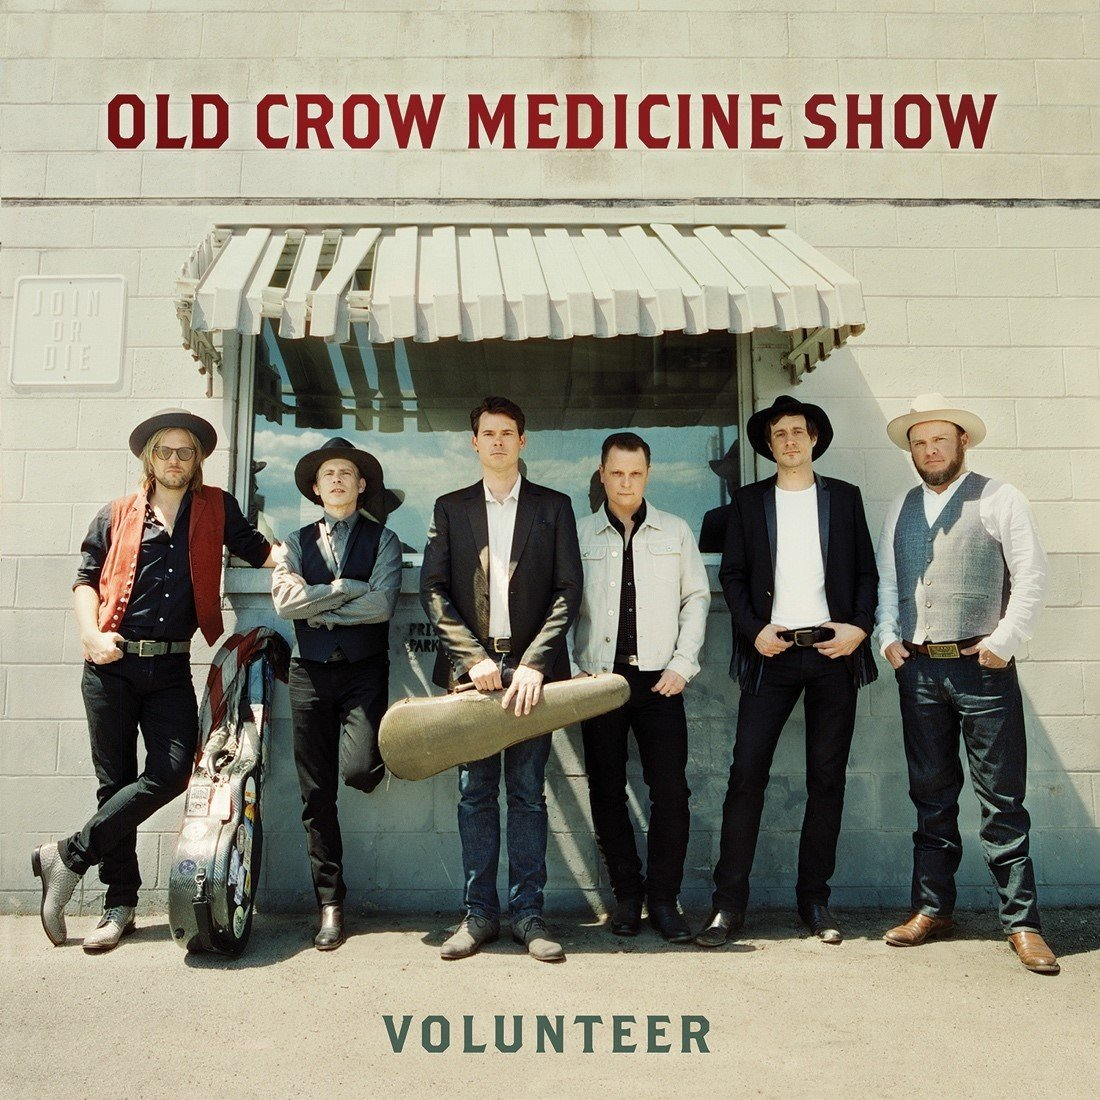 Risultati immagini per old crow medicine show volunteer